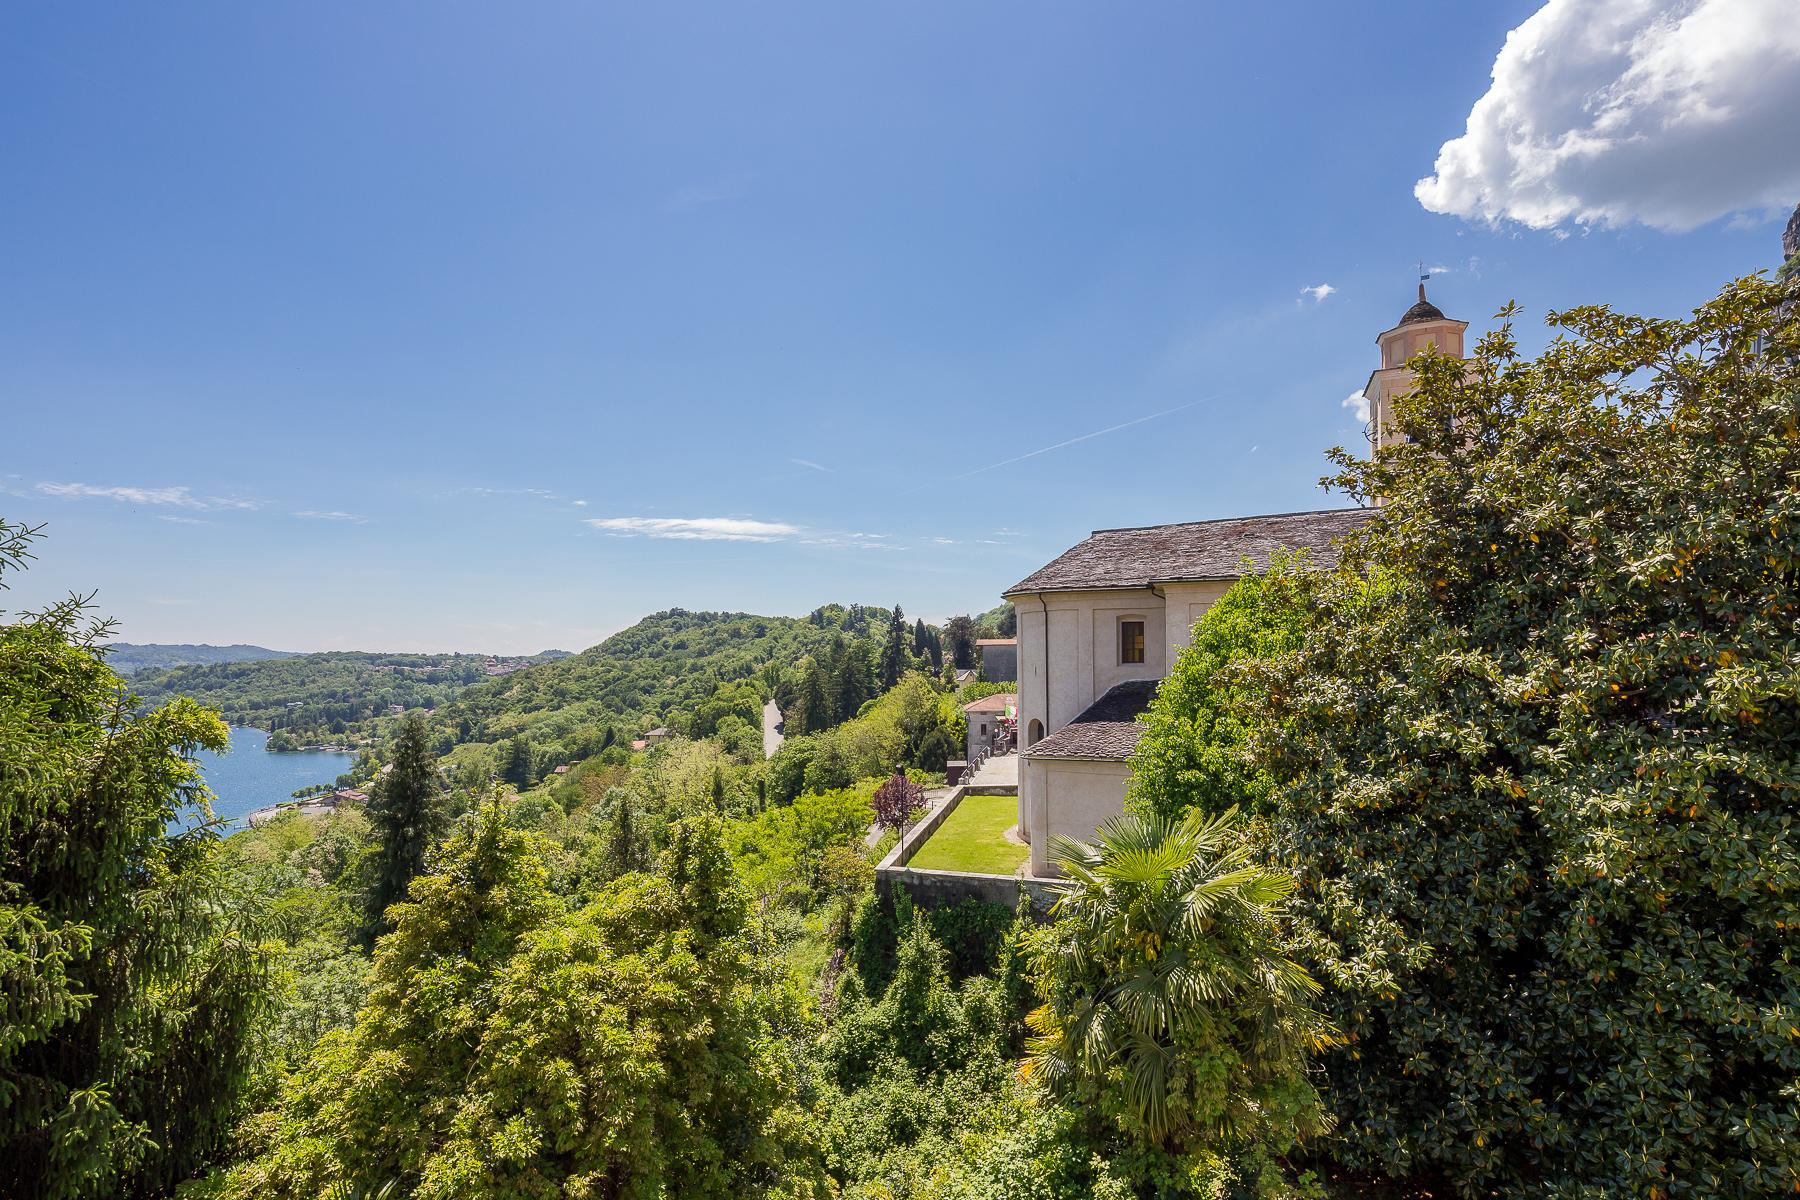 Casa indipendente in Vendita a Pella: 5 locali, 292 mq - Foto 22